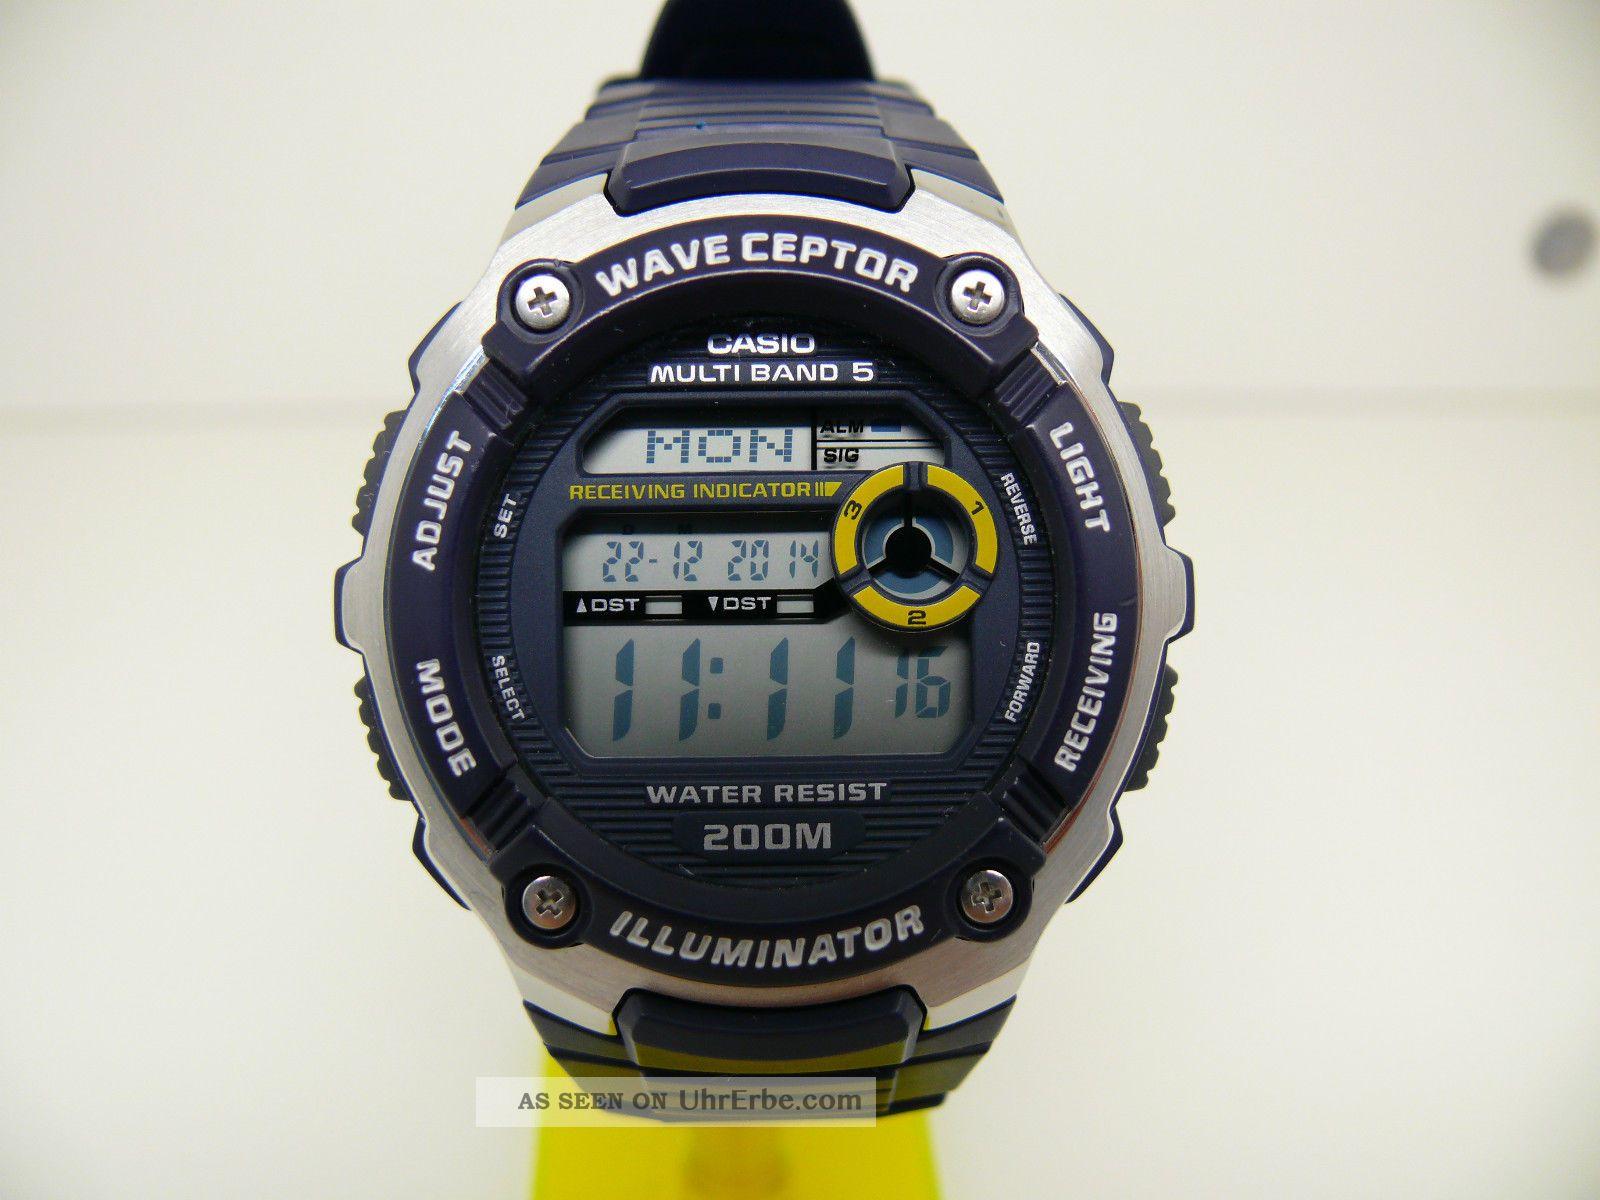 Casio Wv - 200e 3139 Funkuhr Wave Ceptor Herren Armbanduhr World Time Armbanduhren Bild